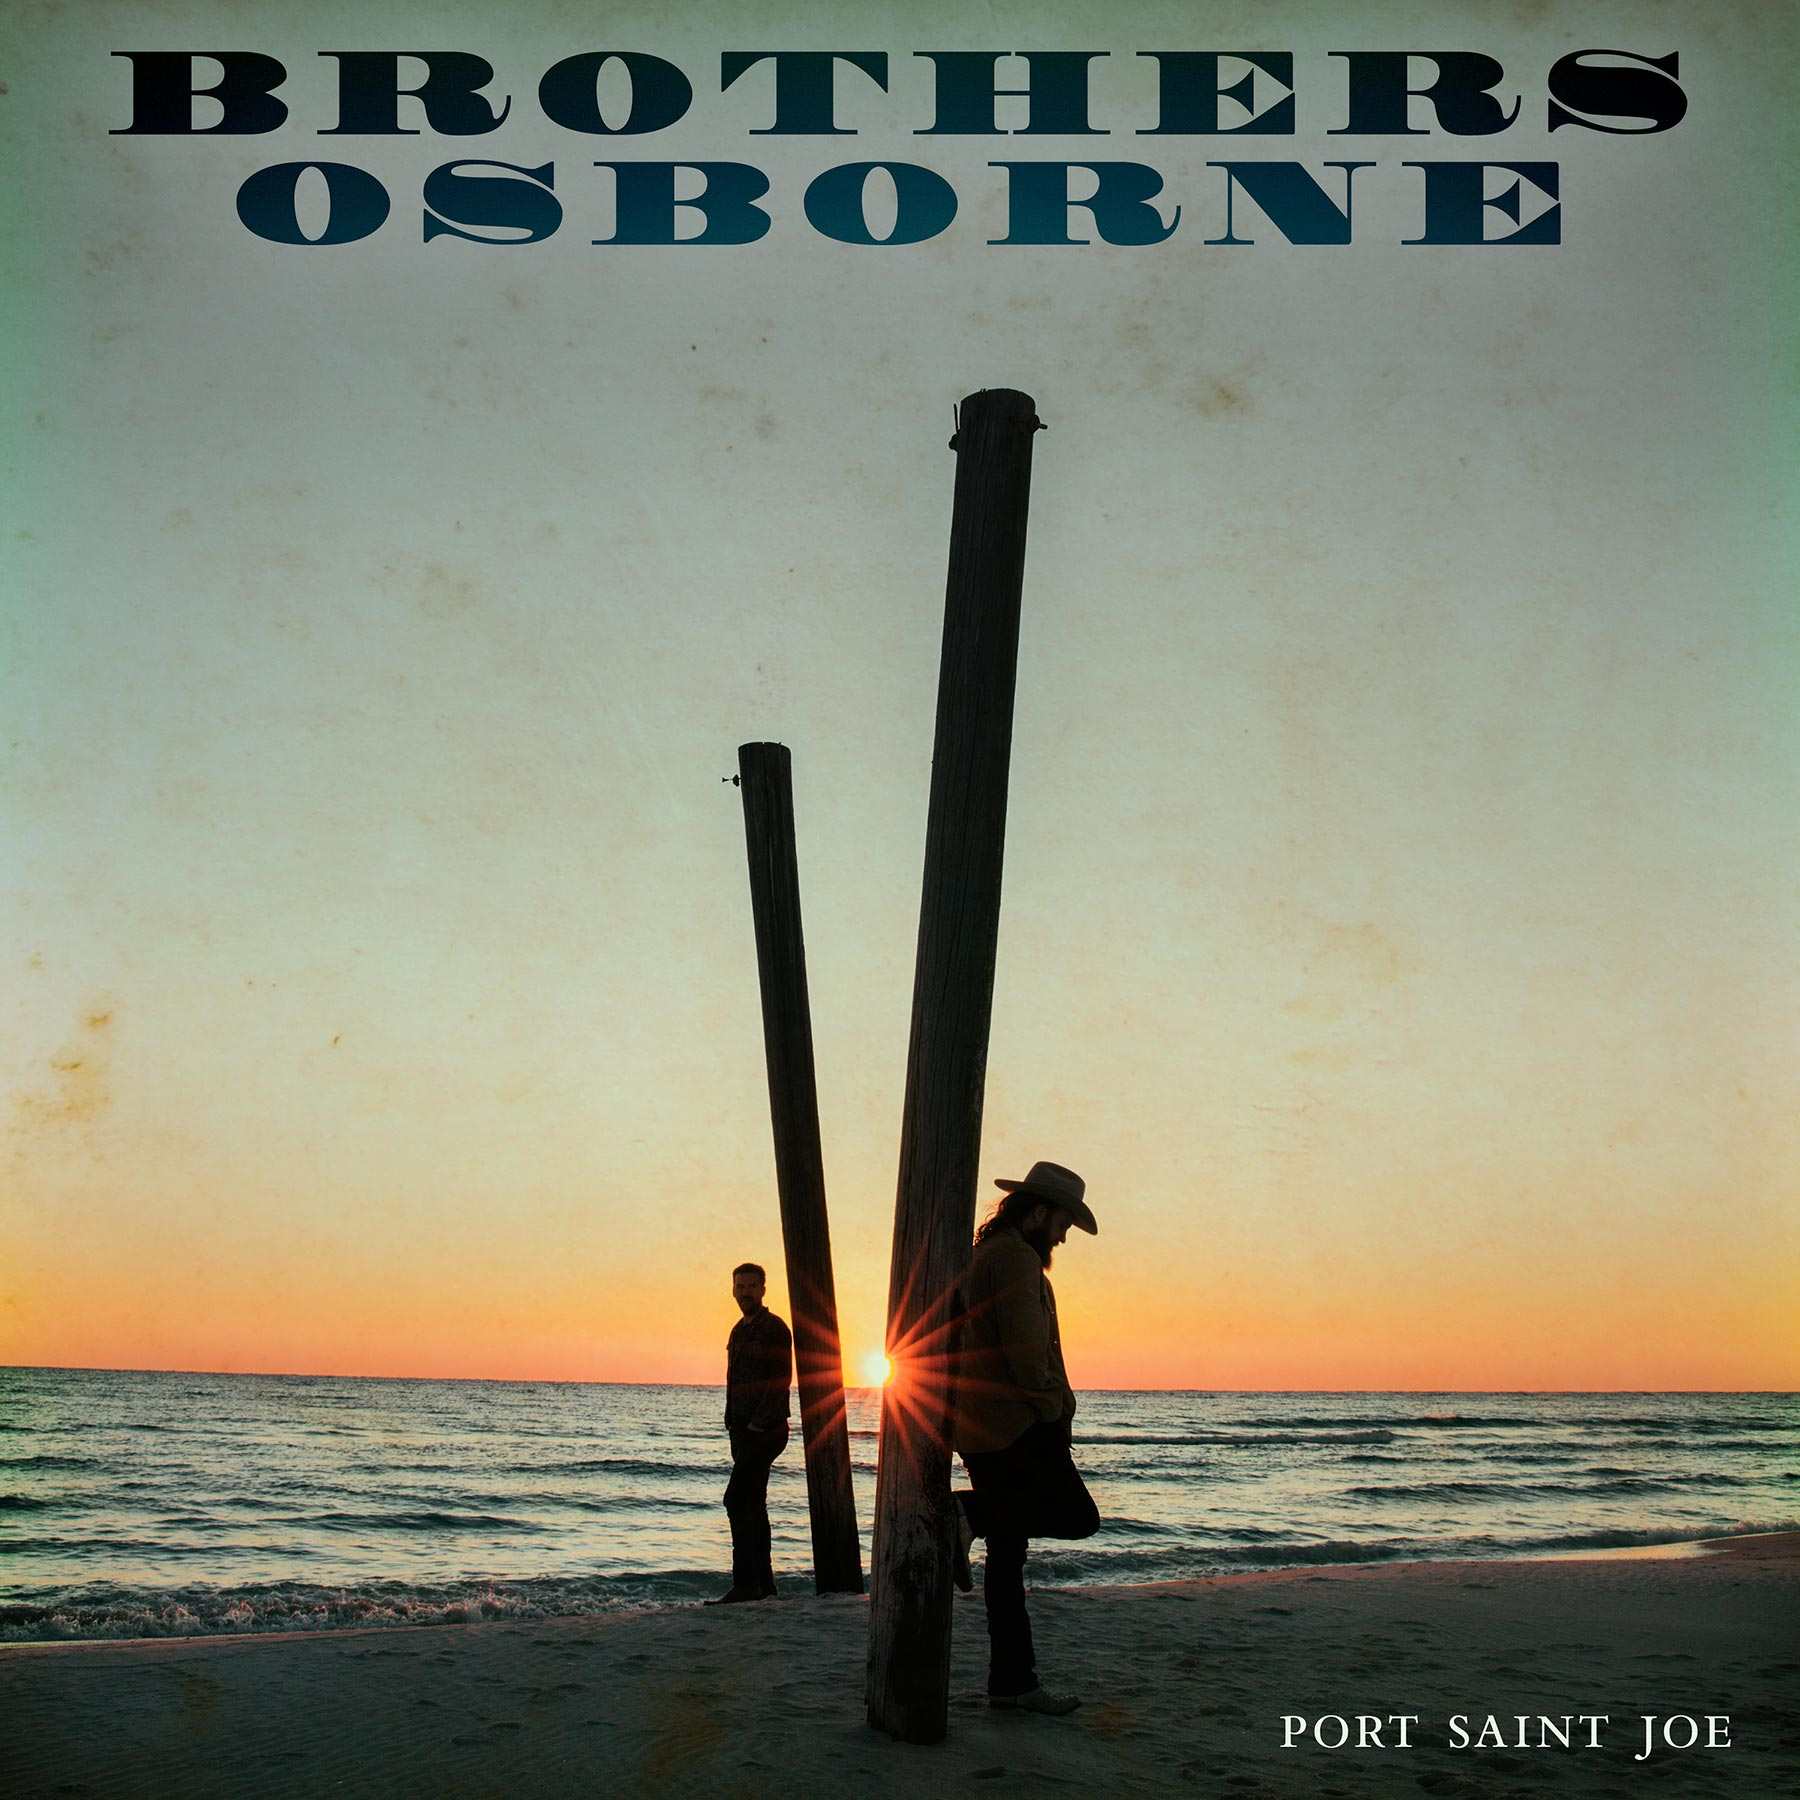 Brothers Osborne - Port Saint Joe CR: EMI Nashville